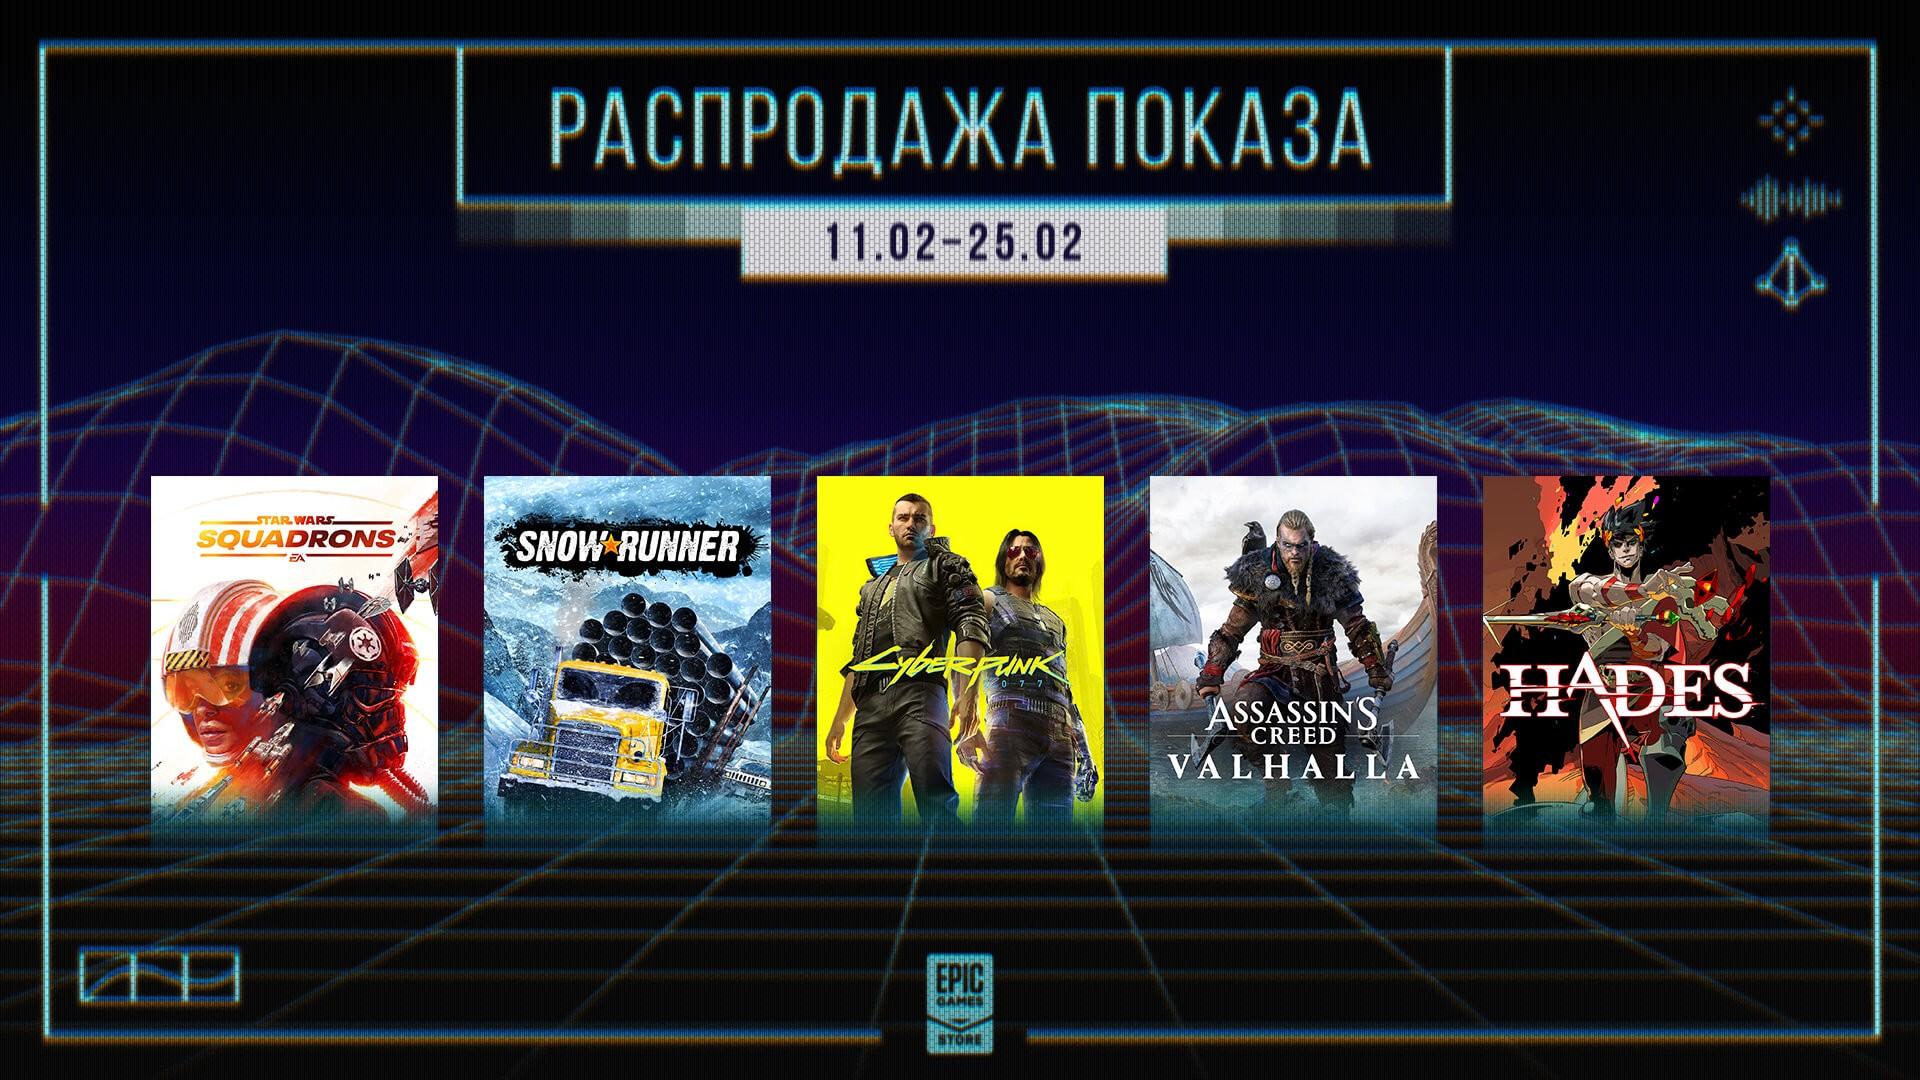 "Epic Games запускает ""Весенний показ"" и распродажу игр в Epic Games Store 11-25 февраля (скидки на Cyberpunk 2077, SW: Squadrons и др.) - ITC.ua"